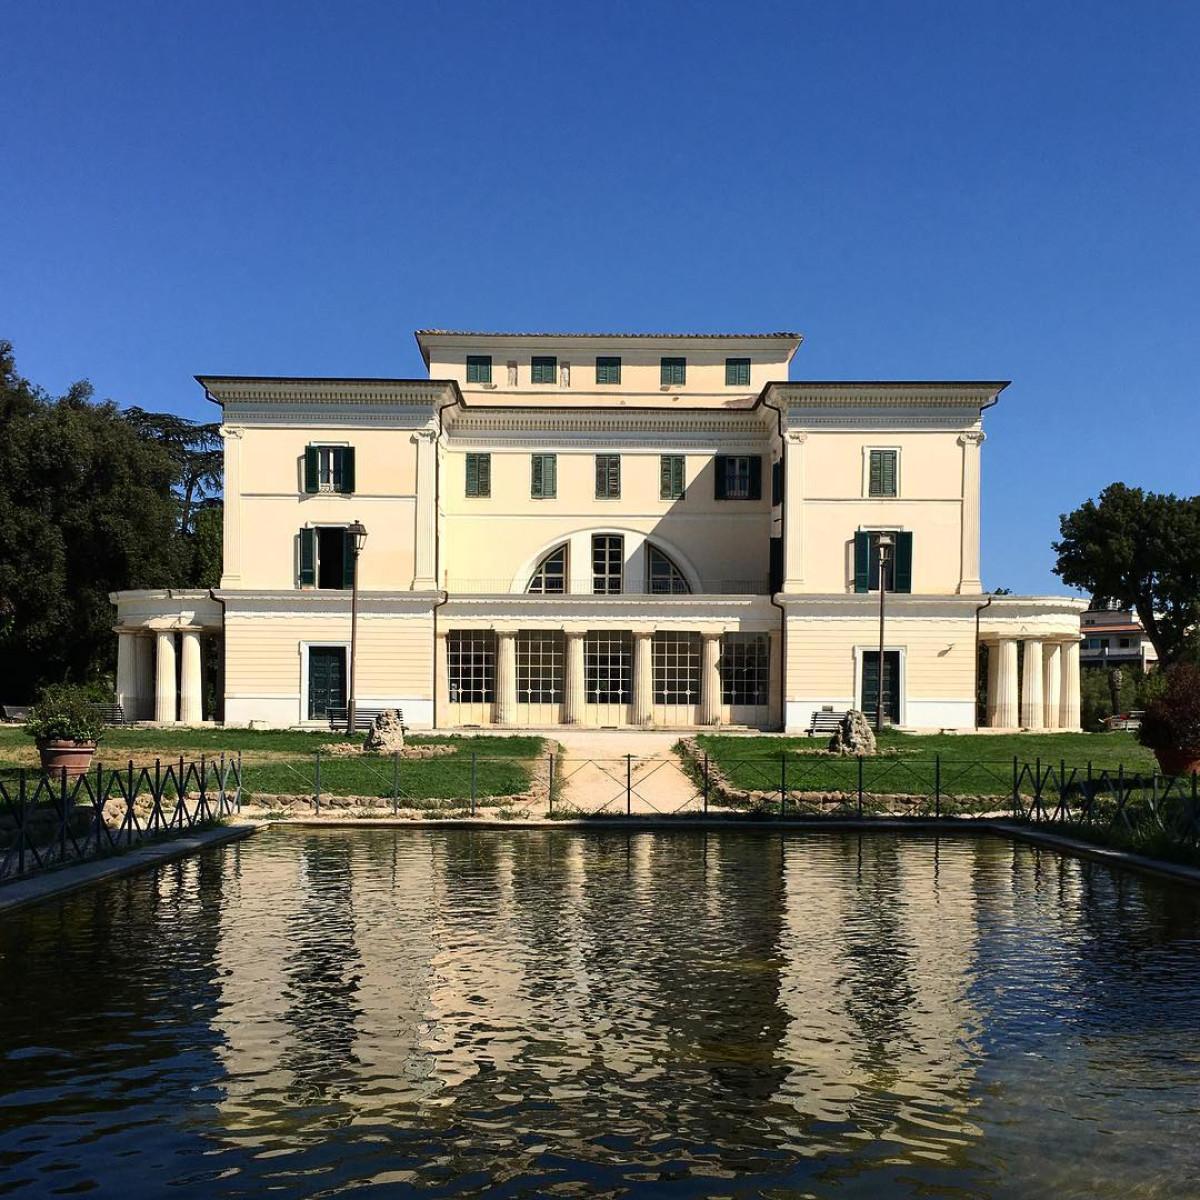 Villa Torlonia Roma credit lallytravelling